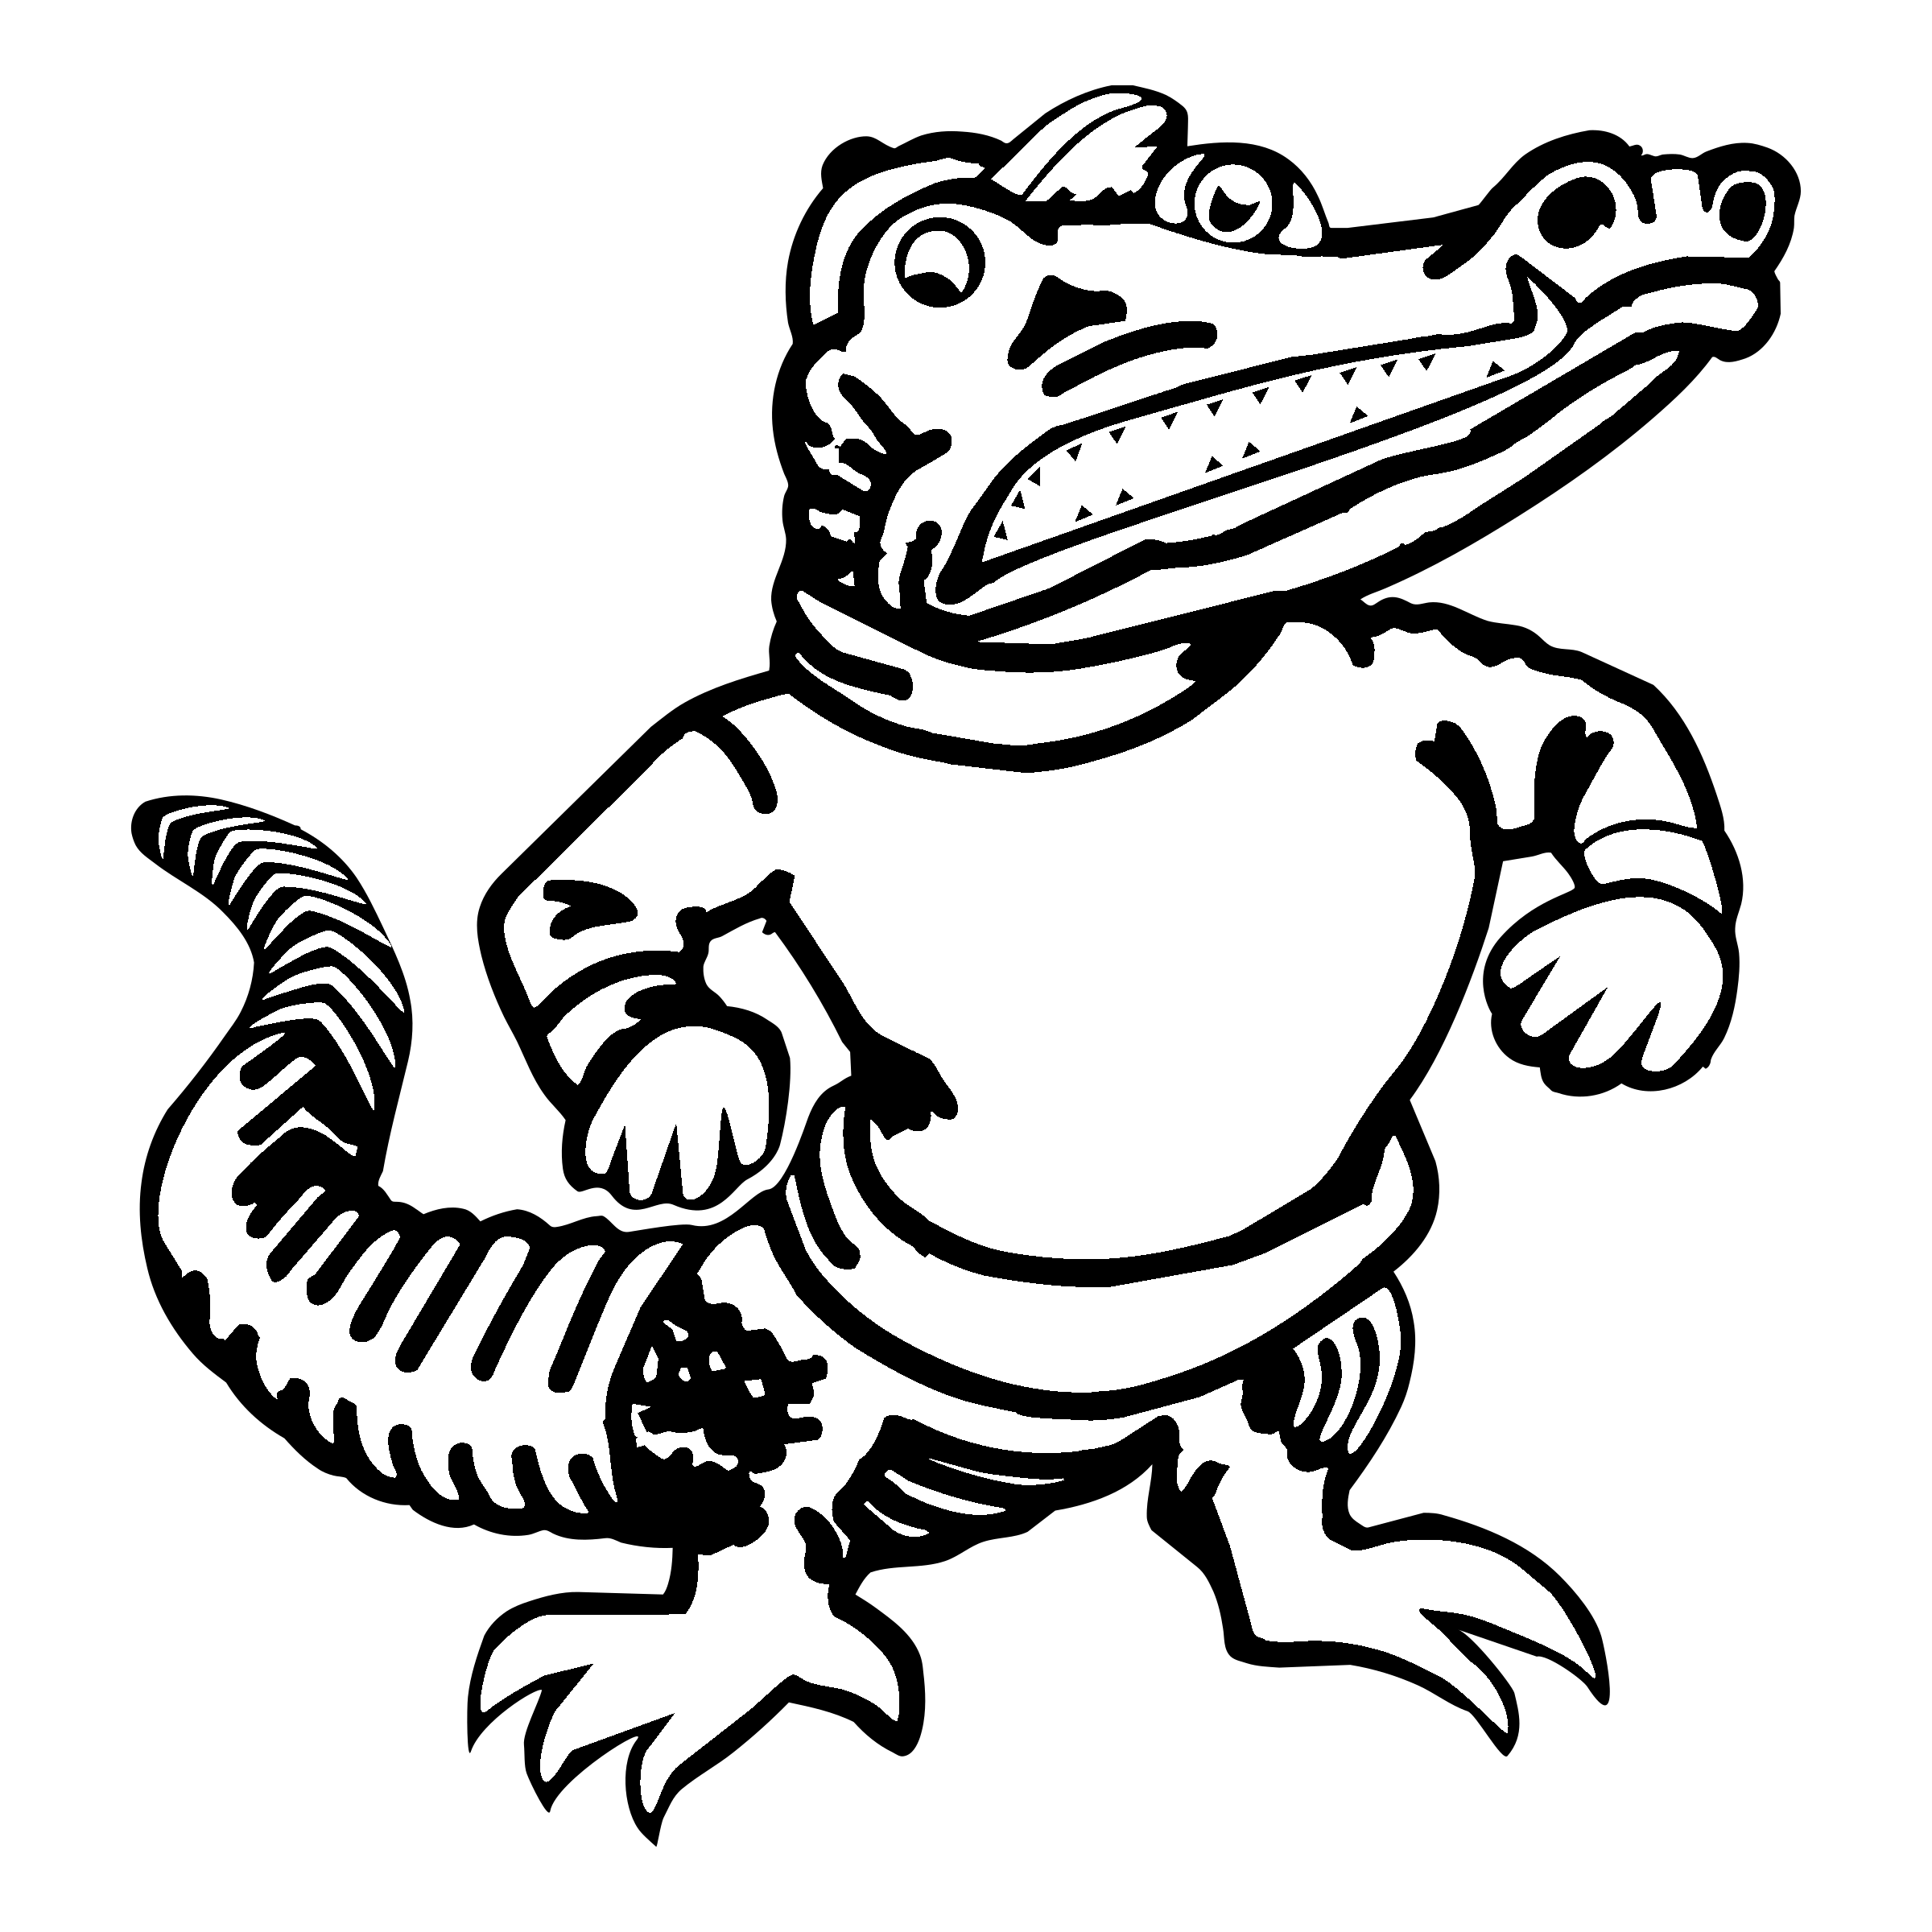 University of Florida Florida Gators football Clip art.